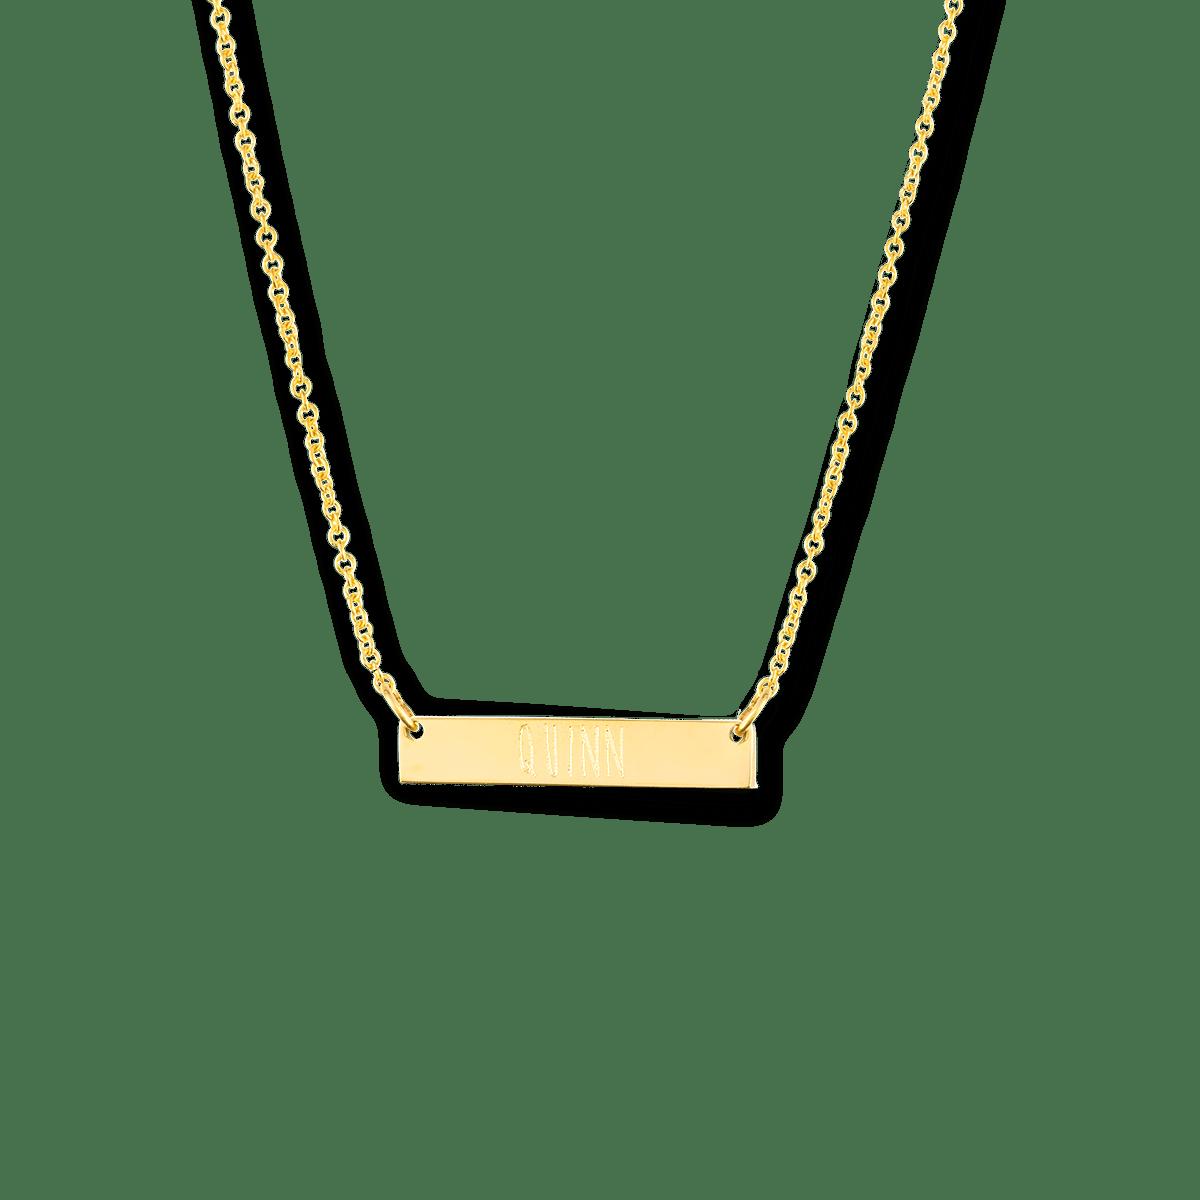 Mini Bar Necklace